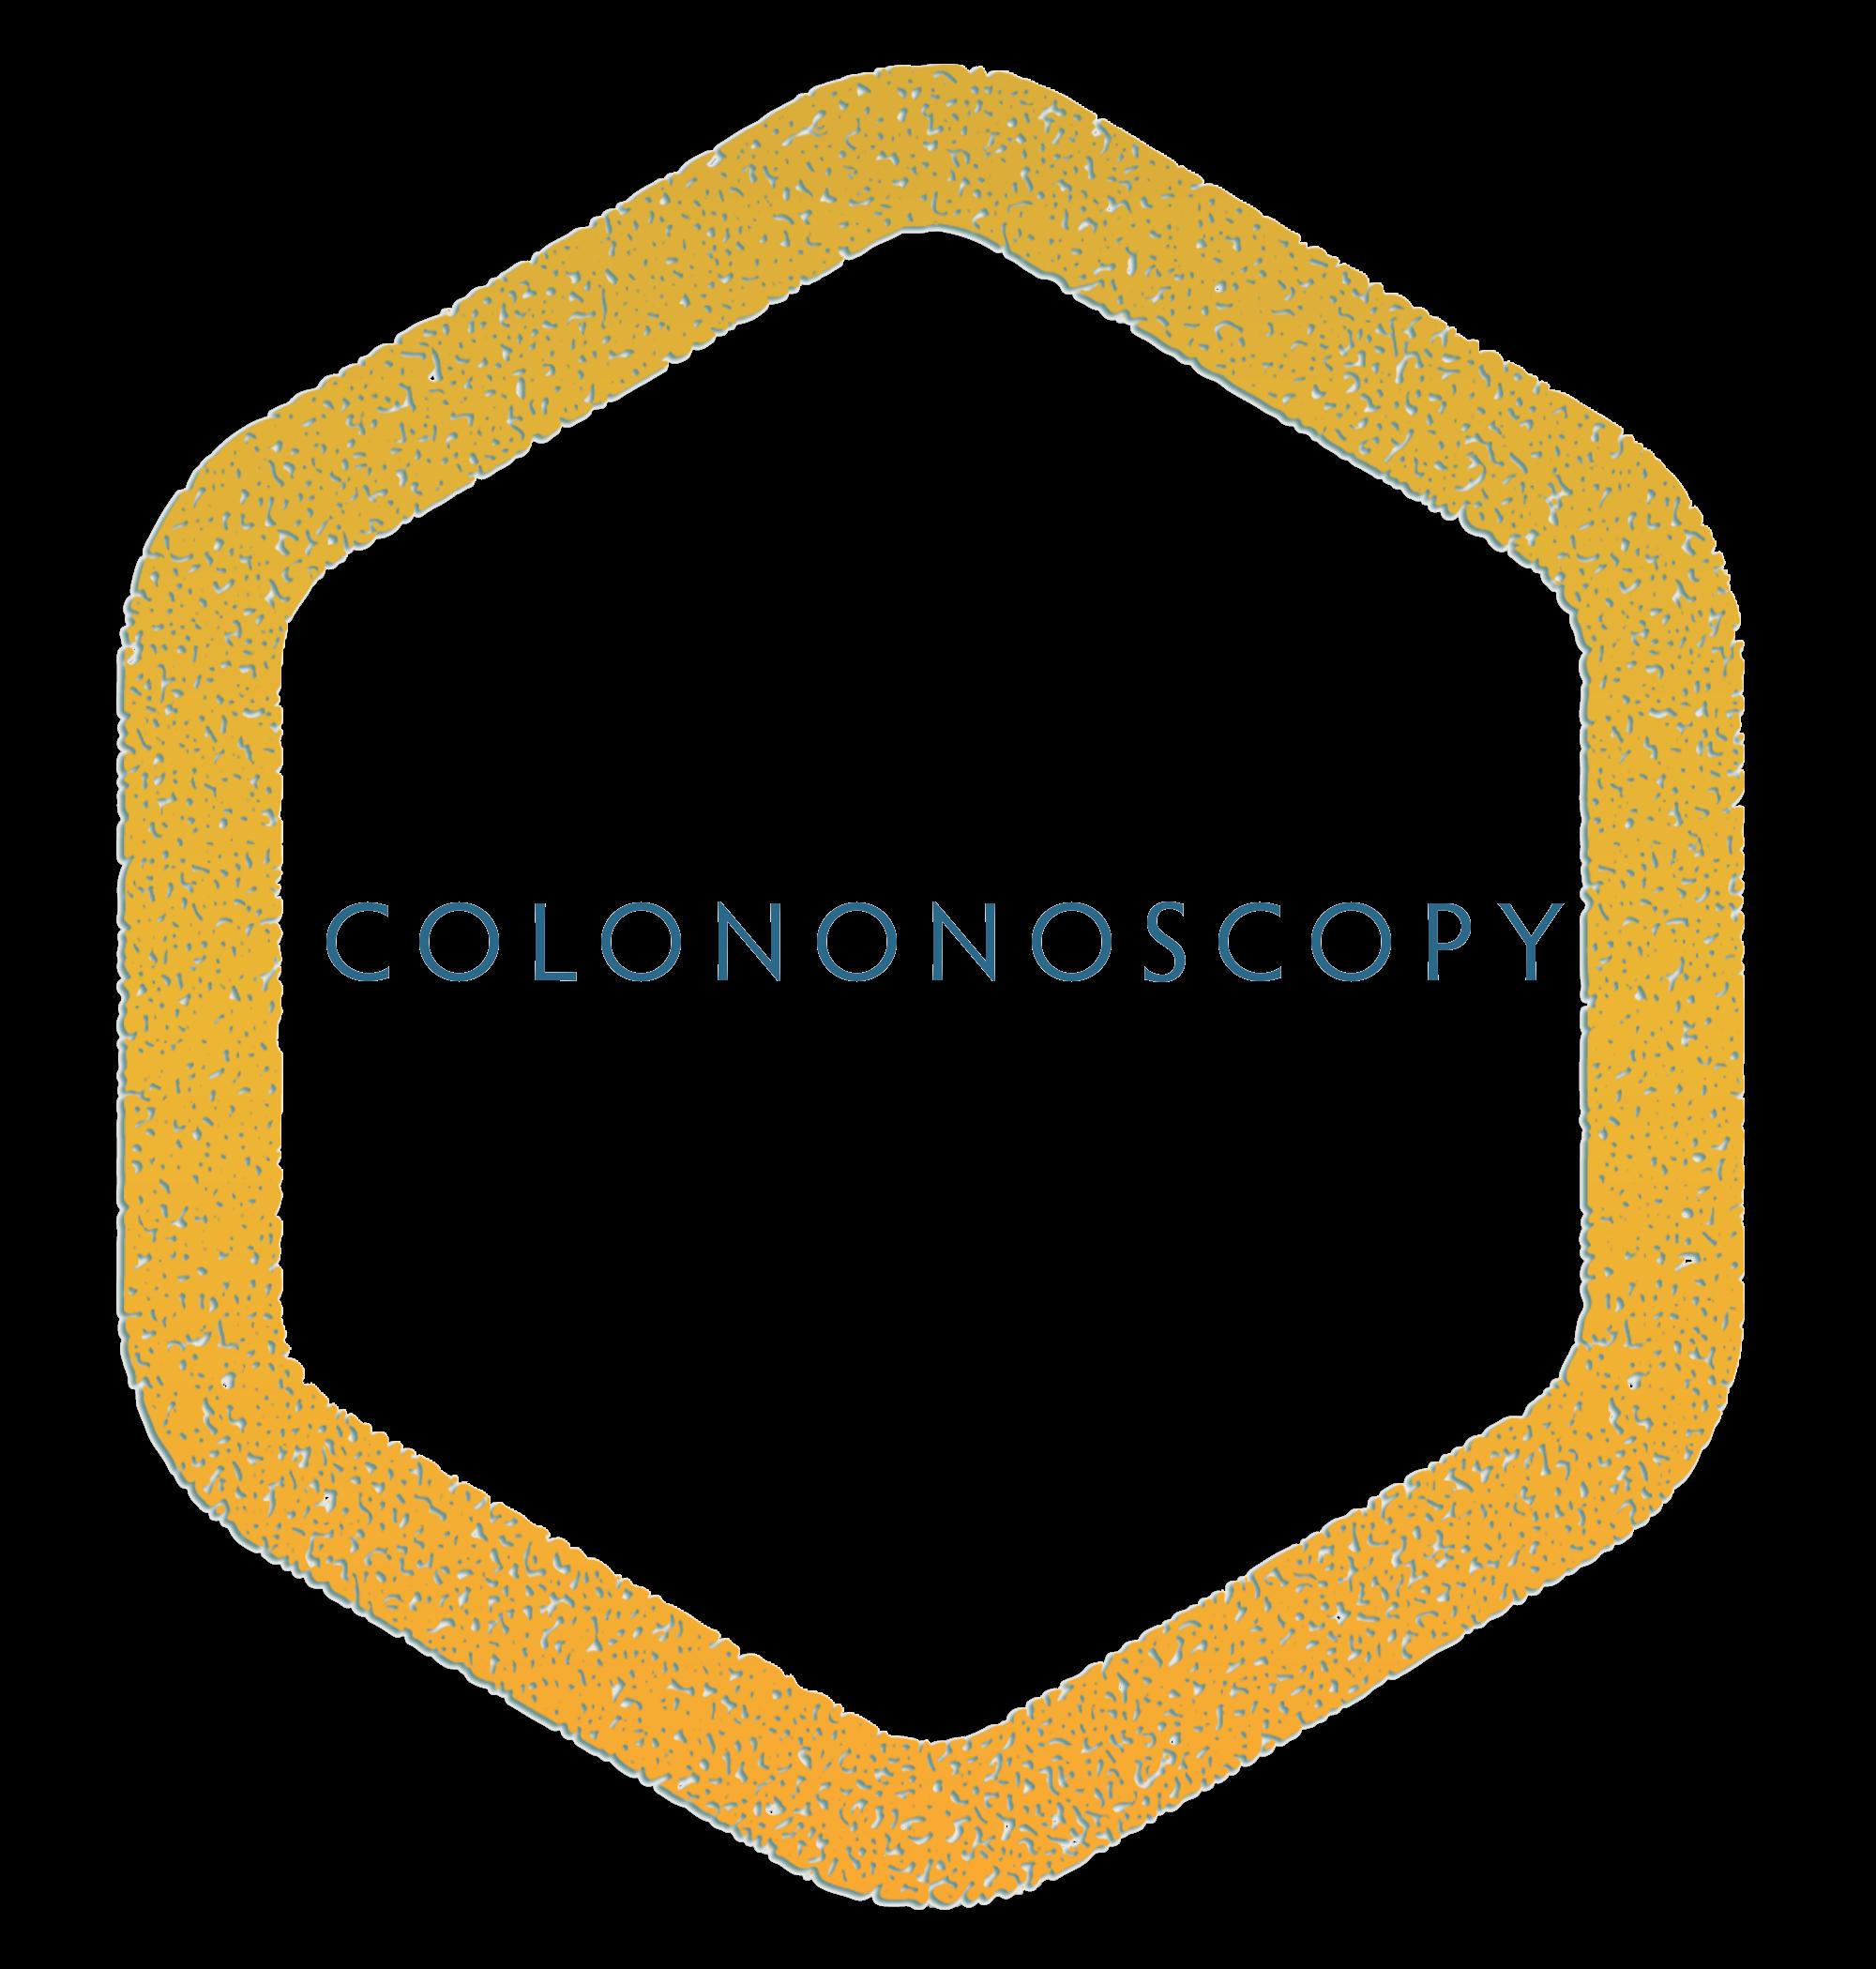 BEVERLY SURGERY CENTER  Colononoscopy _TREATMENT.png